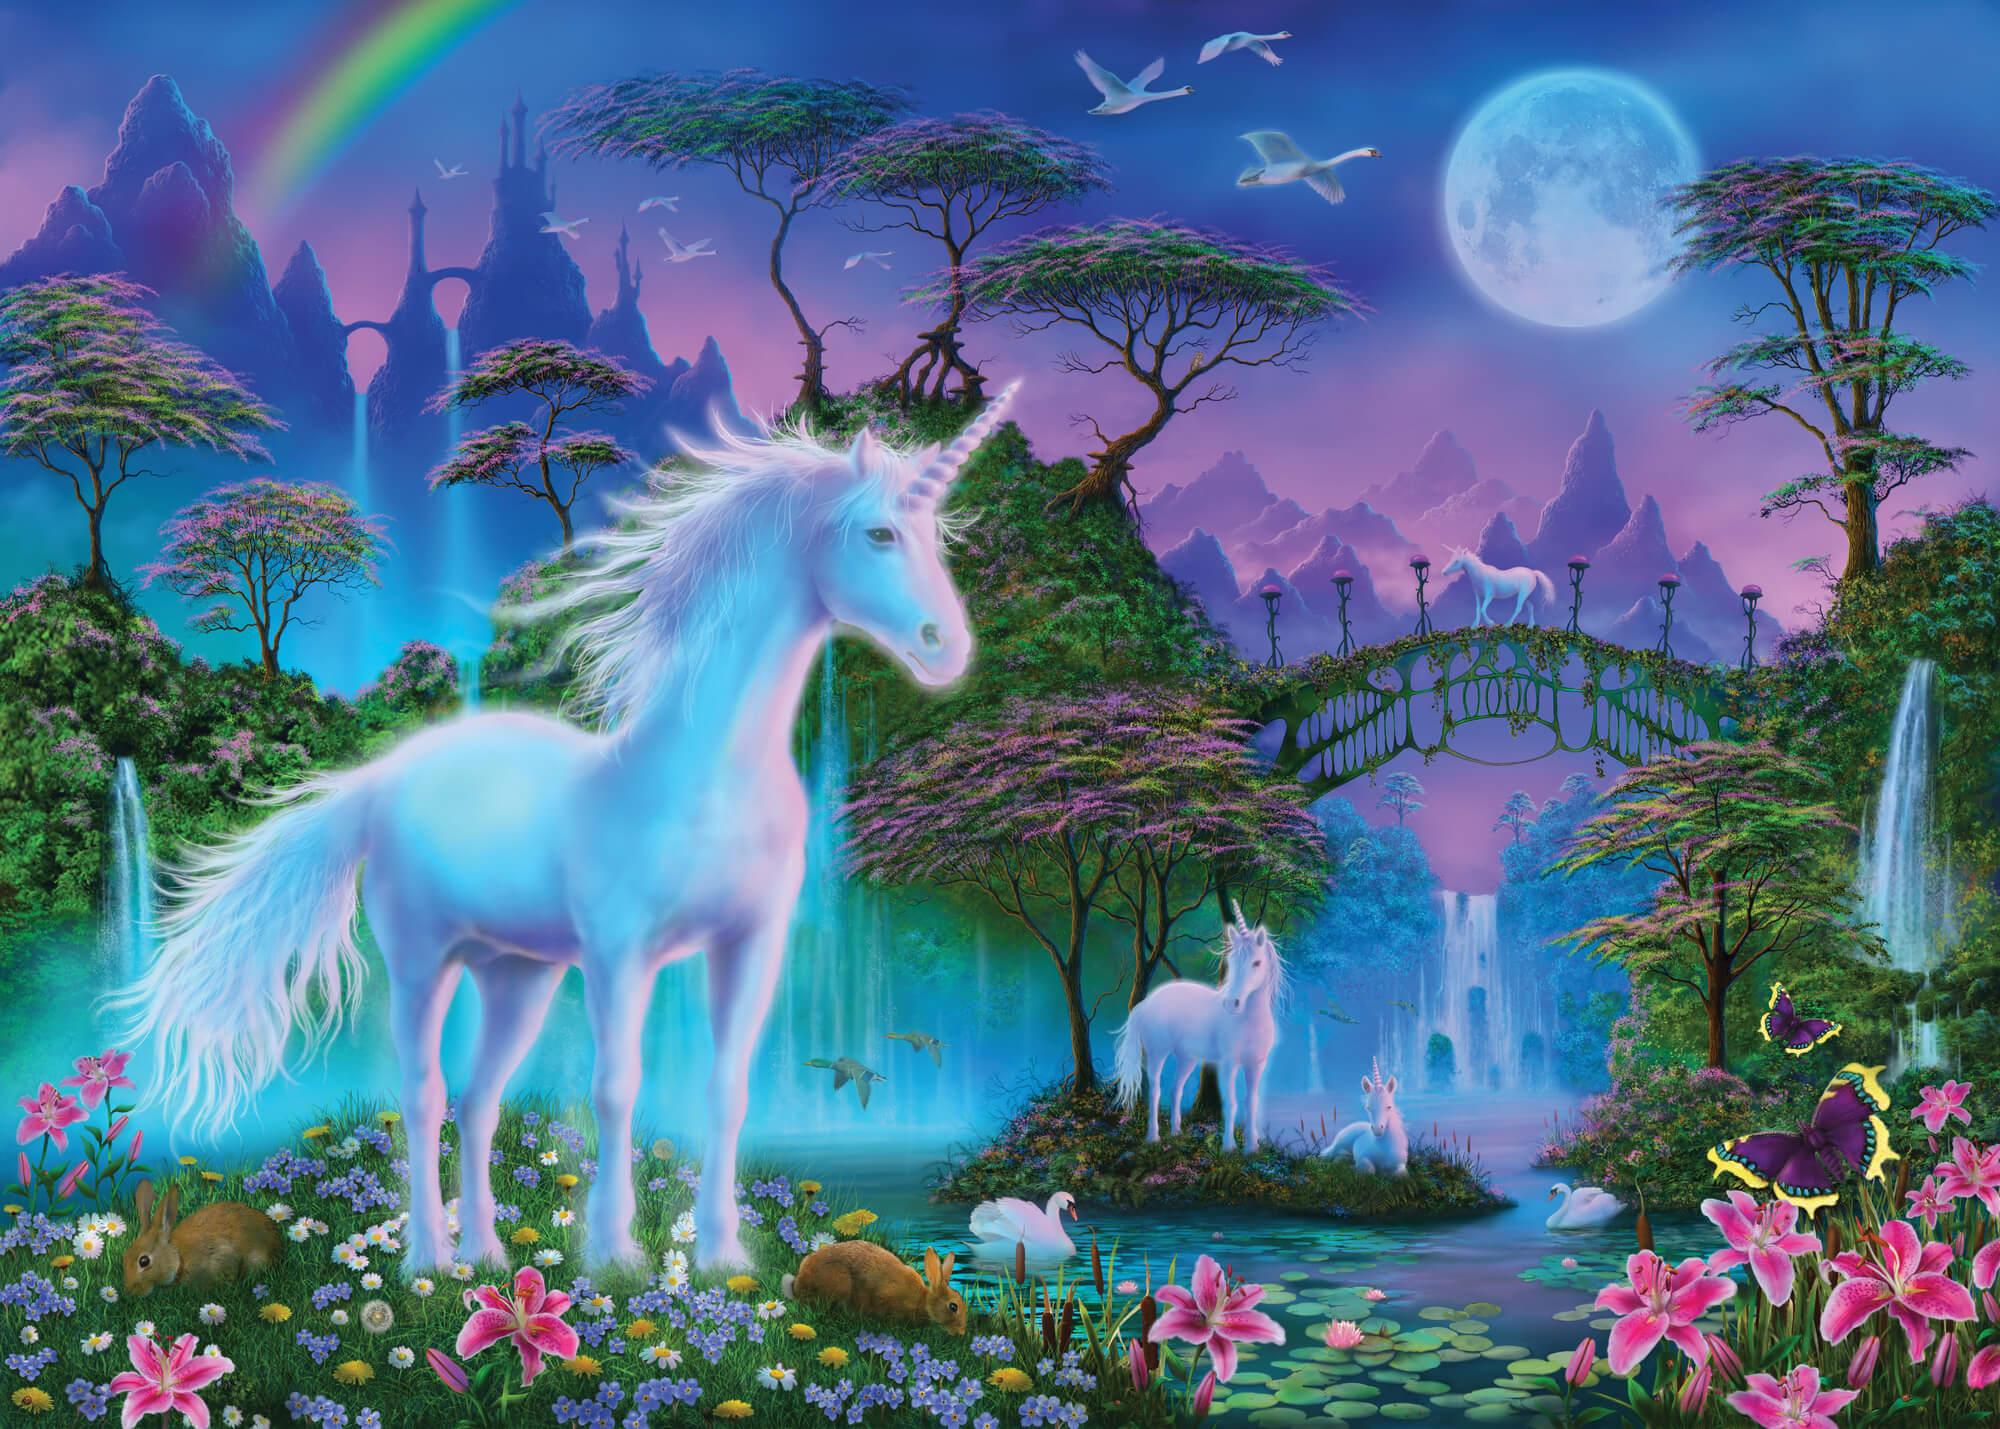 Unicorn Bridge Wall Mural